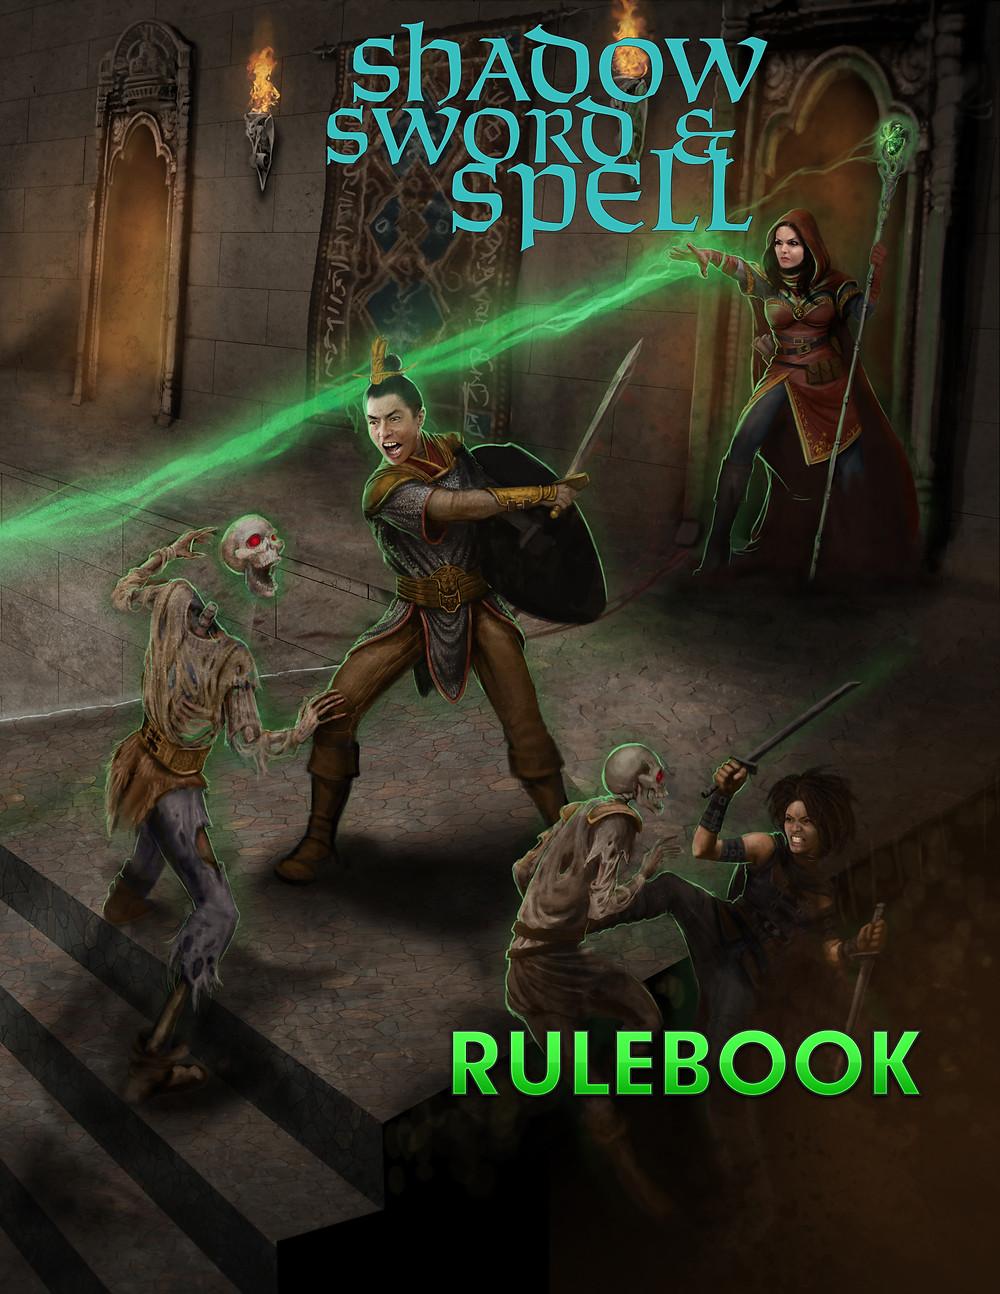 Cover for Shadow, Sword & Spell 2E